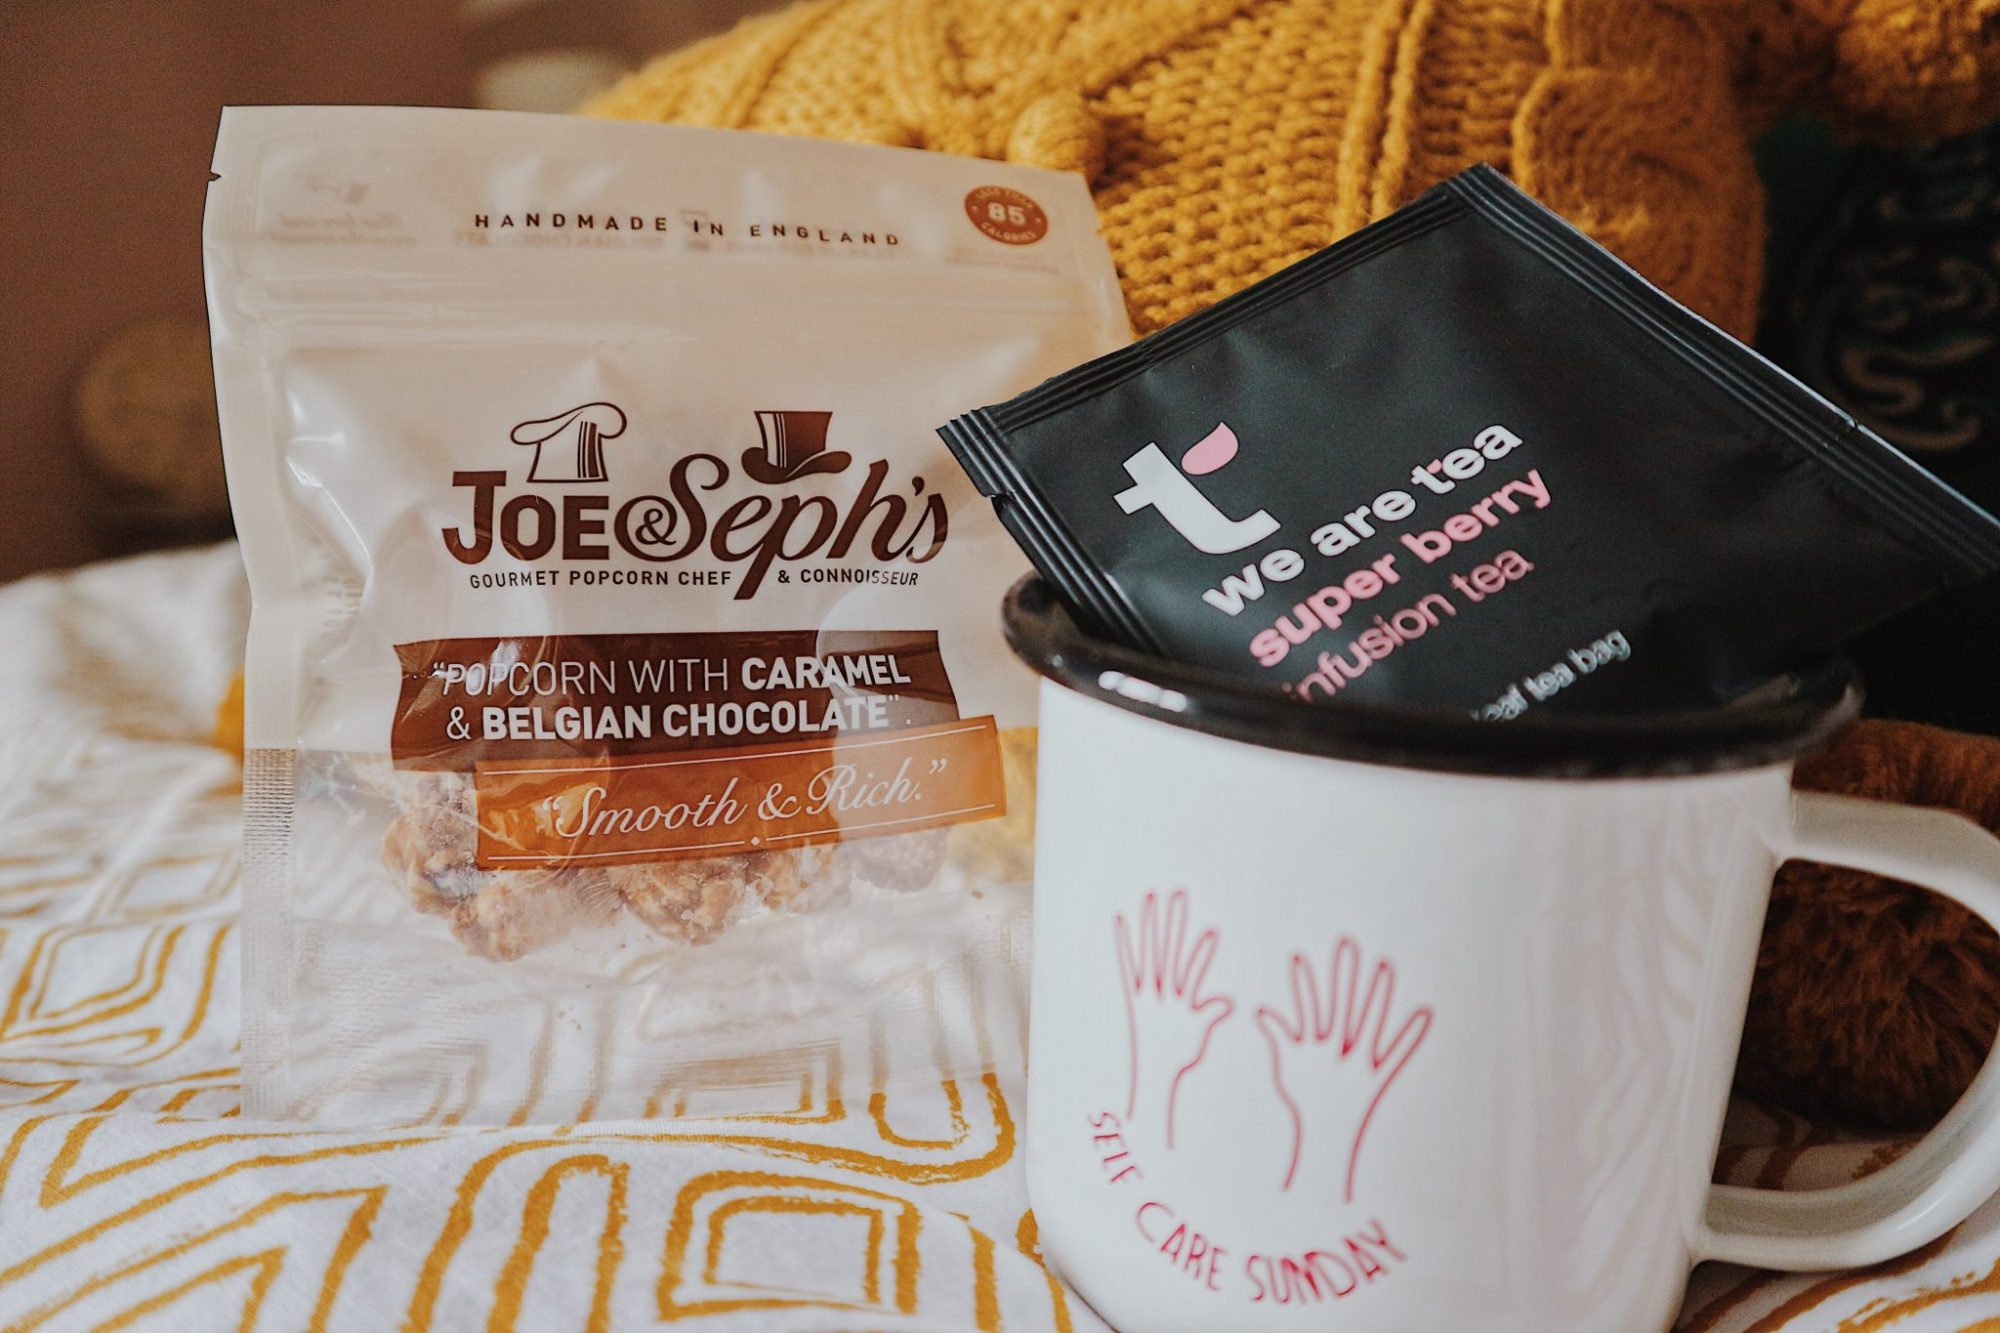 We Are Tea Super Berry Infusion Tea + Joe & Seph's Caramel and Belgian Chocolate Popcorn